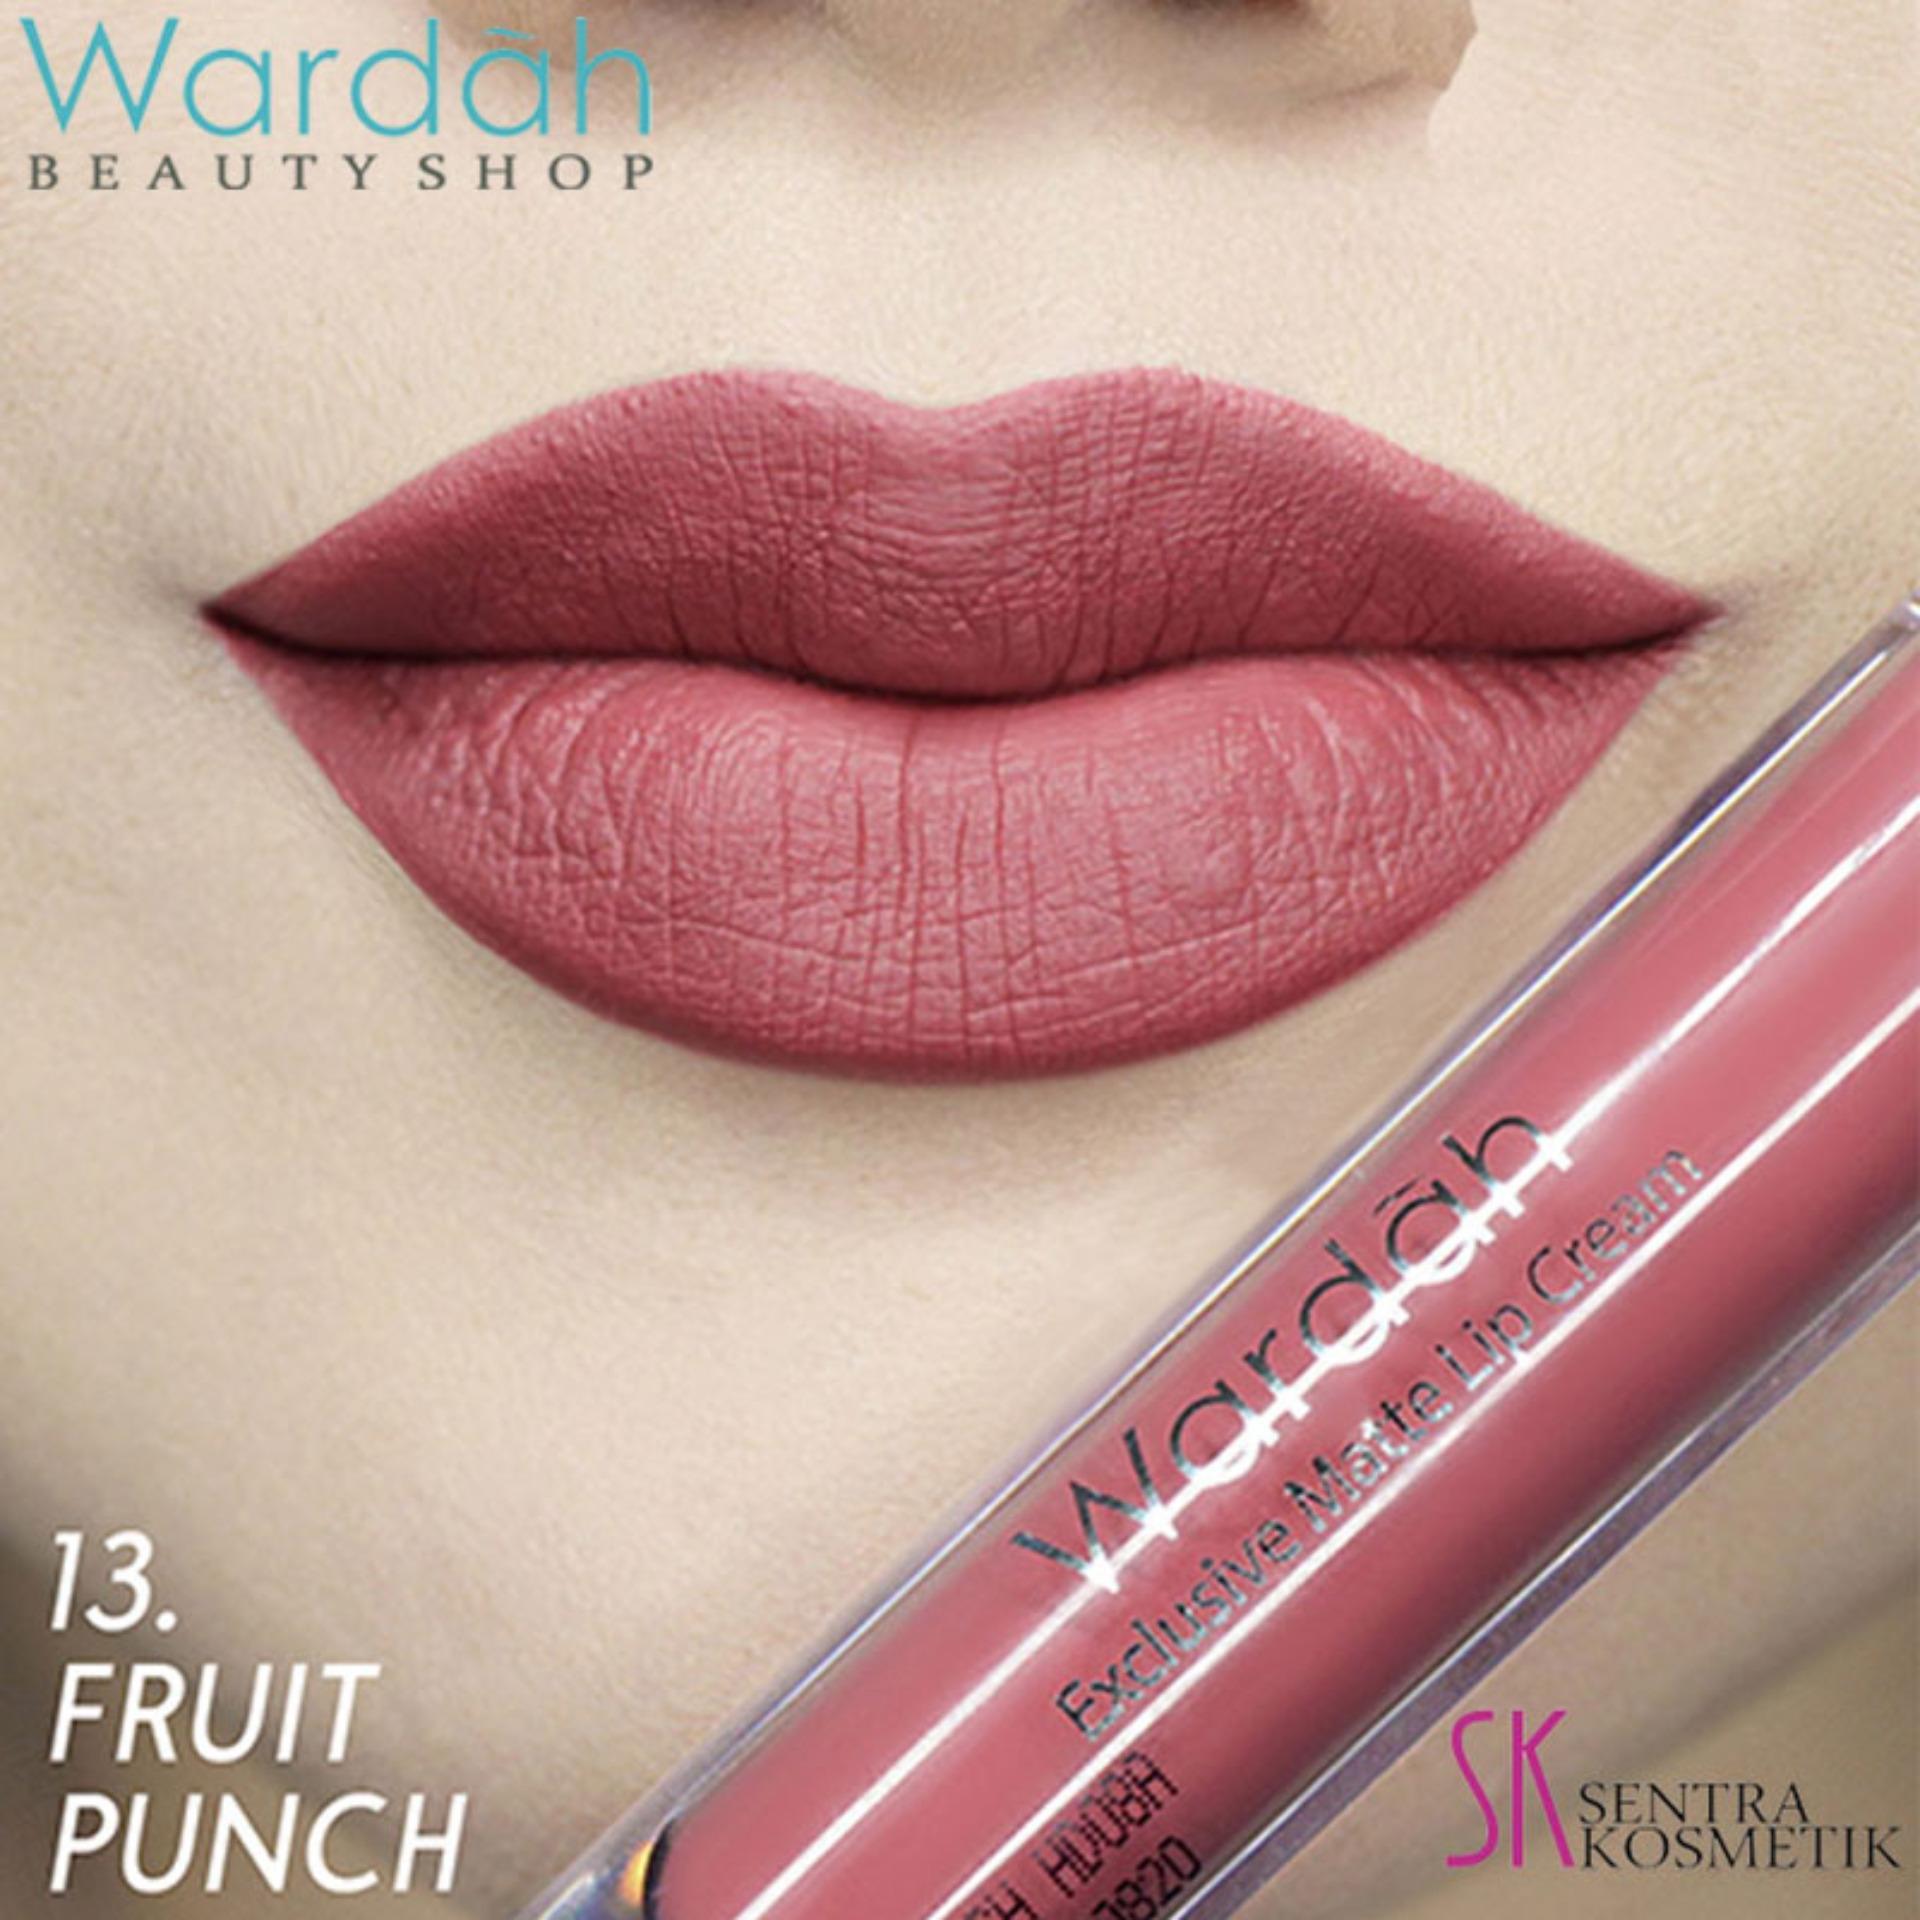 Lipstik Wardah Warna Pink Tua | The Art Of Beauty